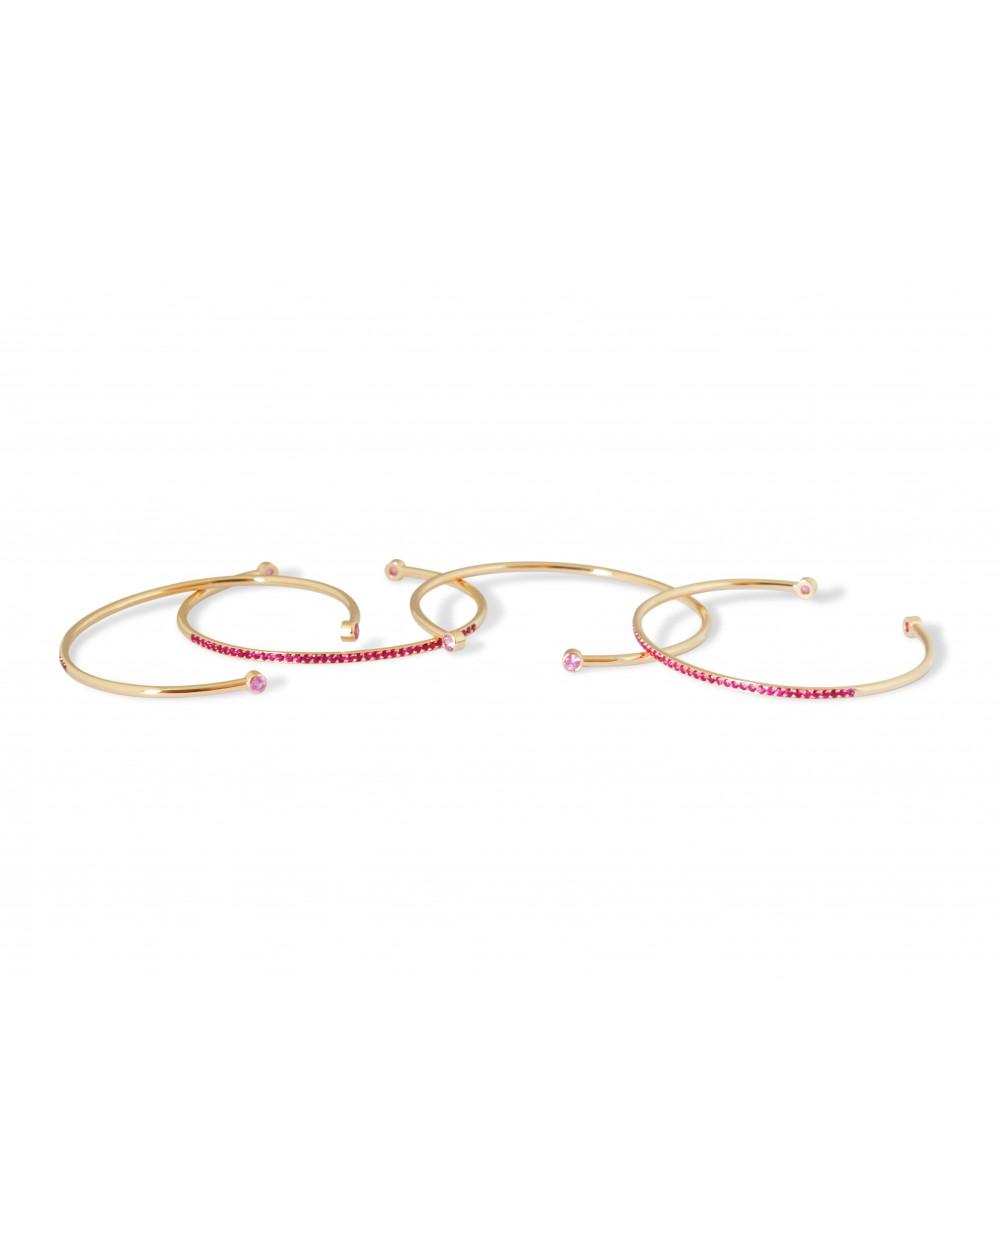 Set of 4 bracelets Pink gold, purple...